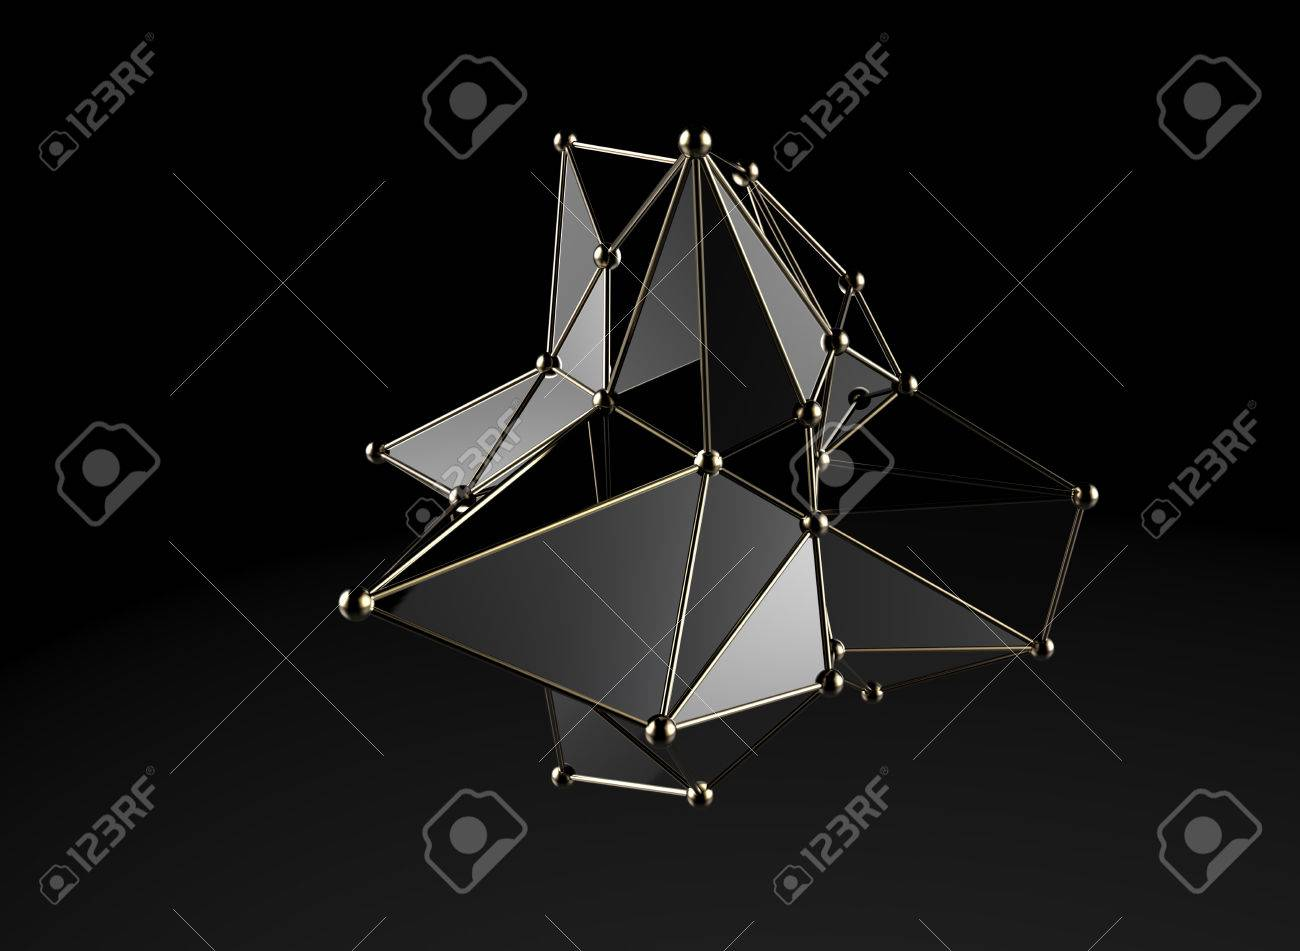 Futuristic digital abstract plexus style 3d molecule model - 40970004